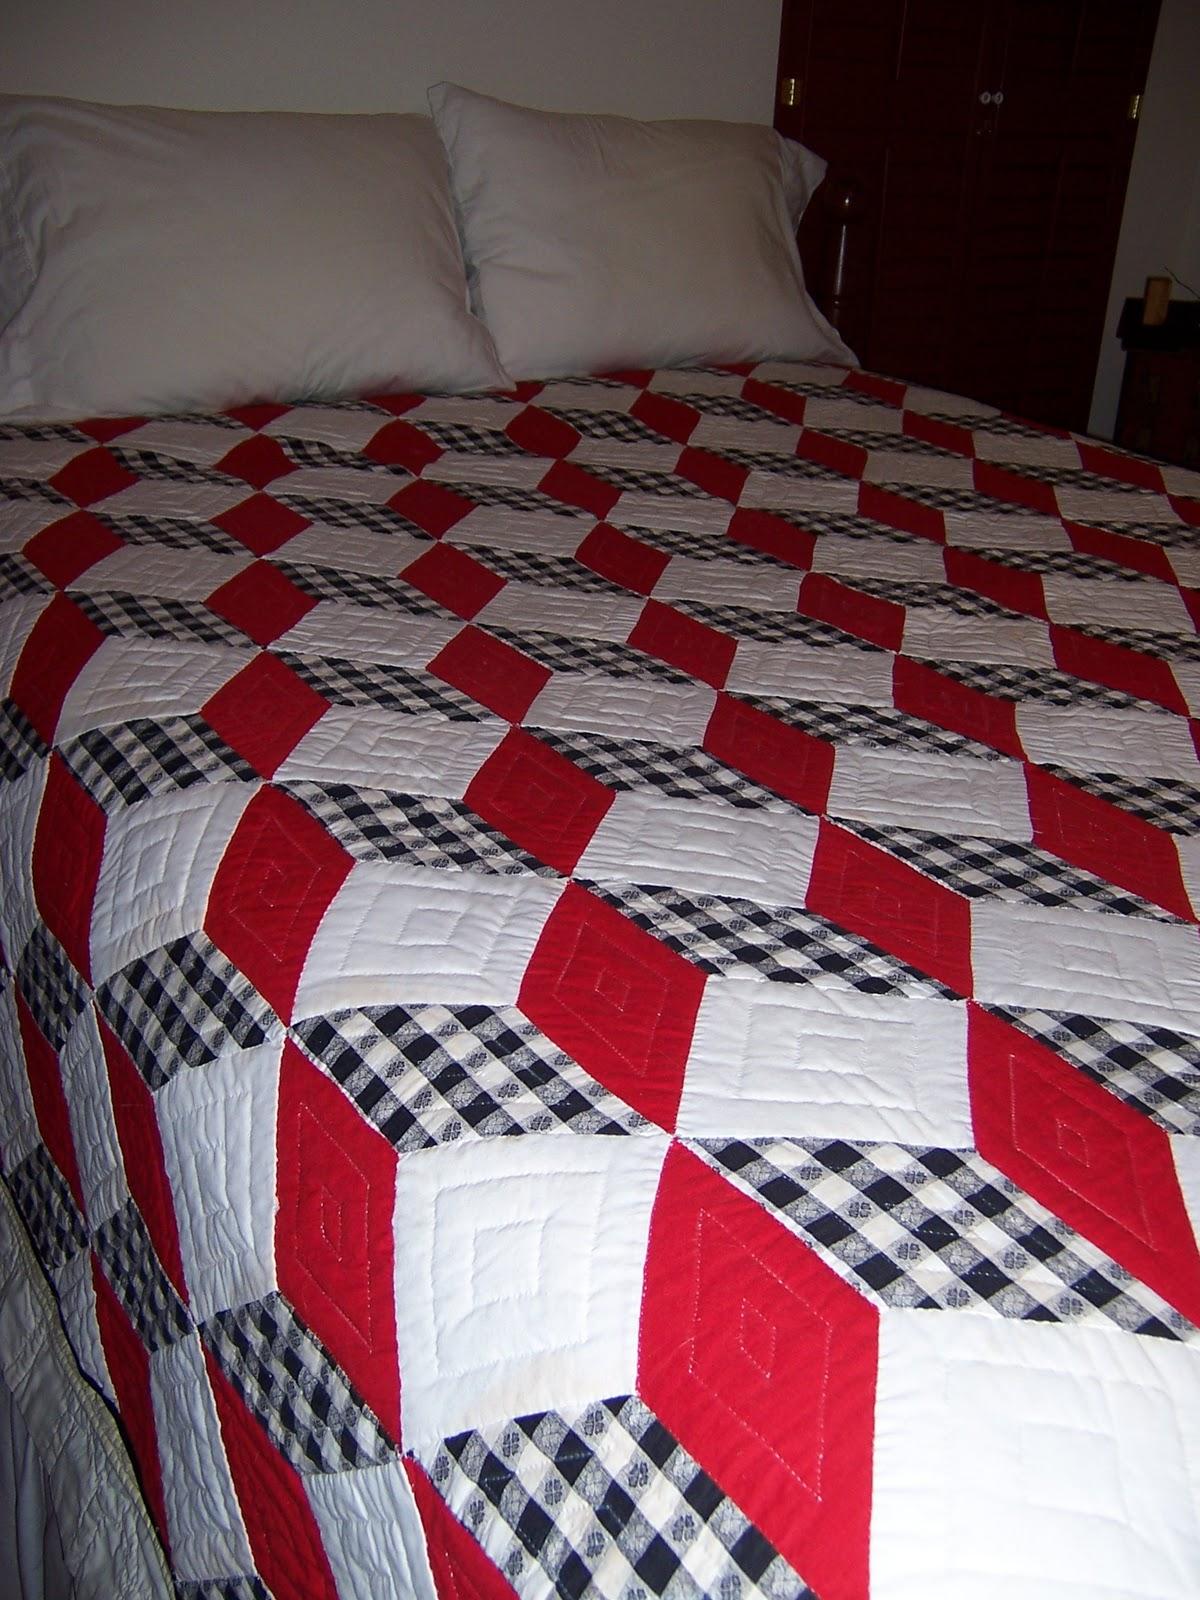 Samplings From Spring Creek Nestled All Snug In Their Beds